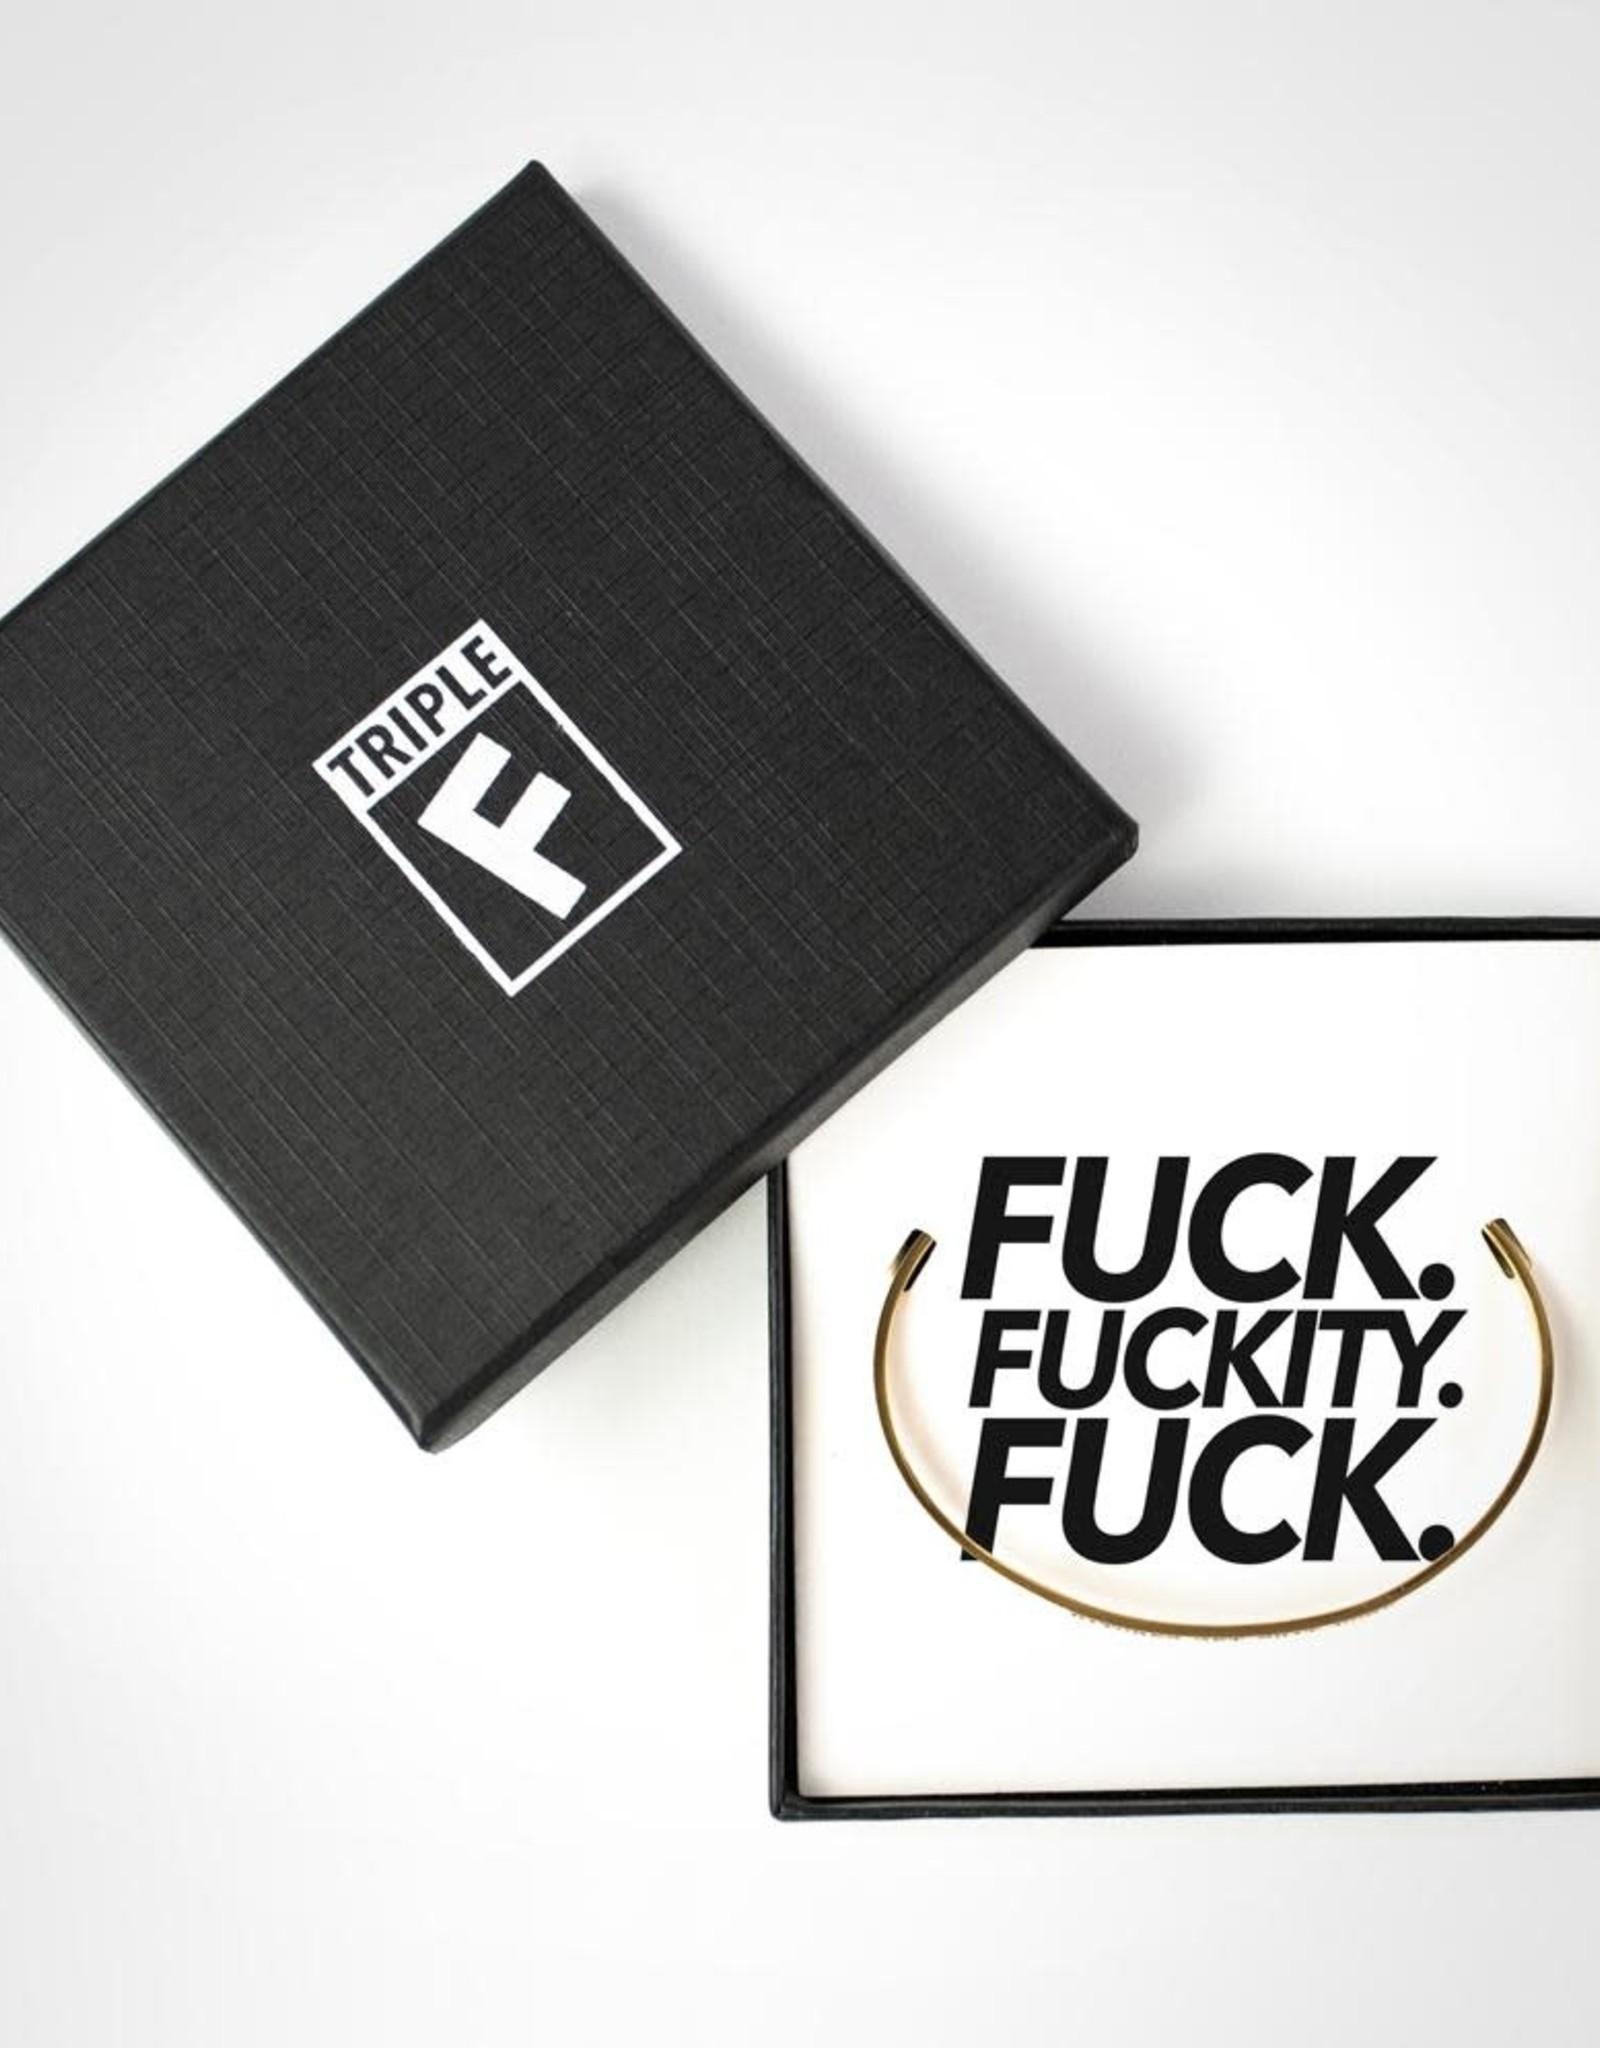 Bracelet - Fuck Fuckity Fuck (Gold)